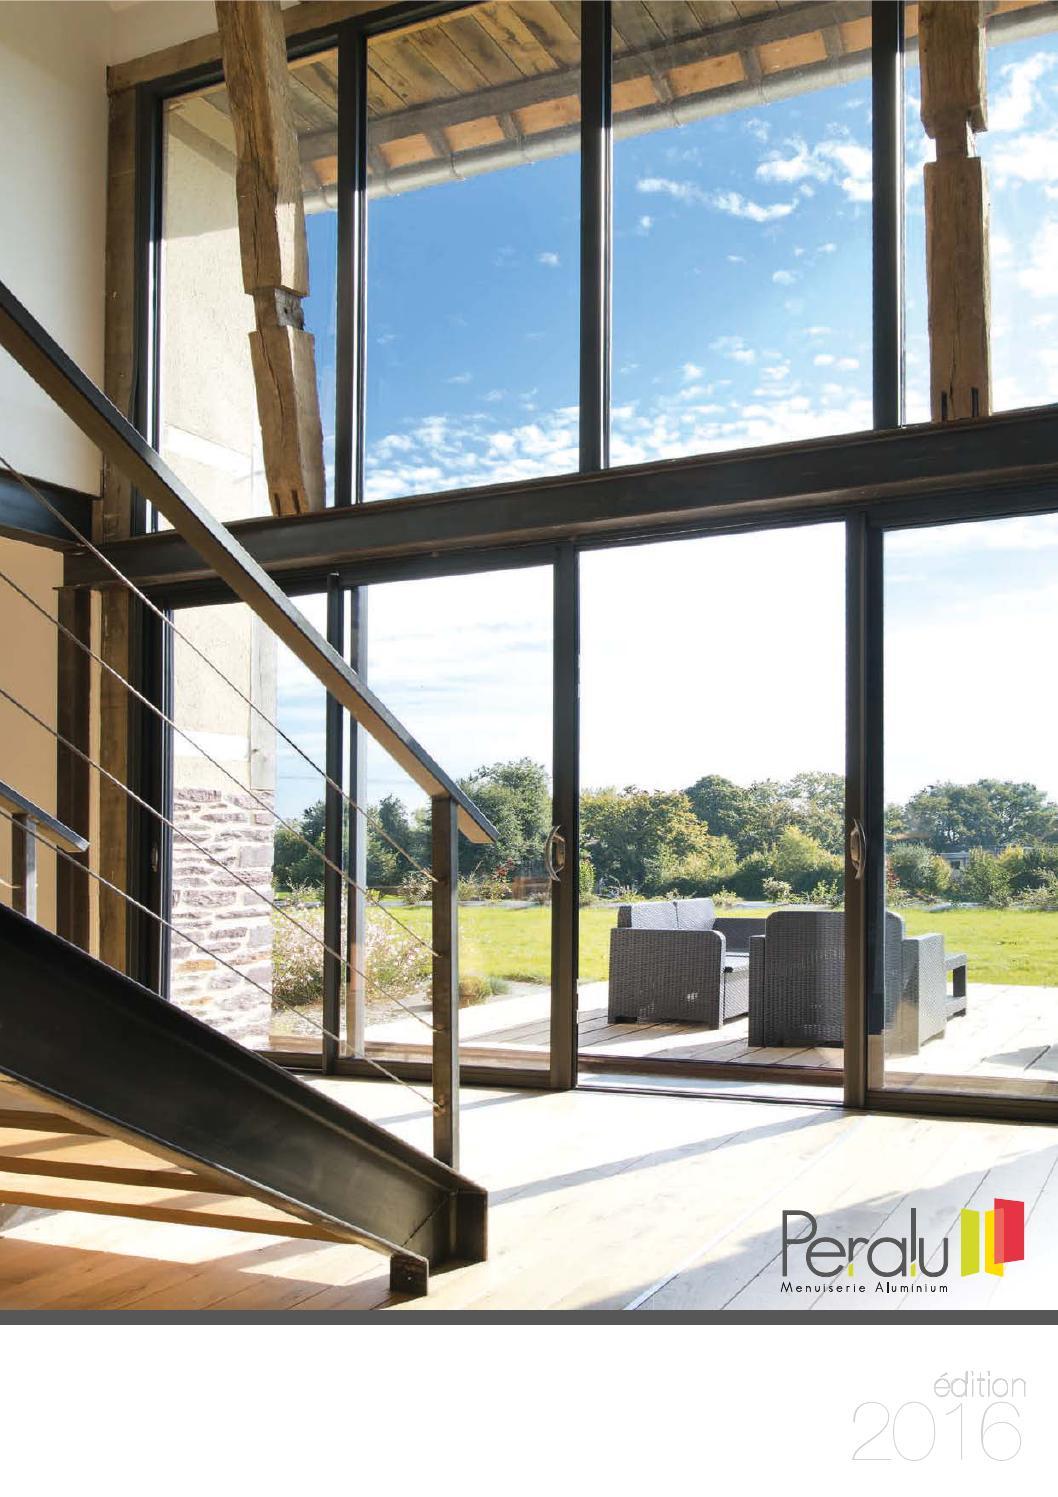 menuiseries aluminium by beaulieu menuiseries issuu. Black Bedroom Furniture Sets. Home Design Ideas